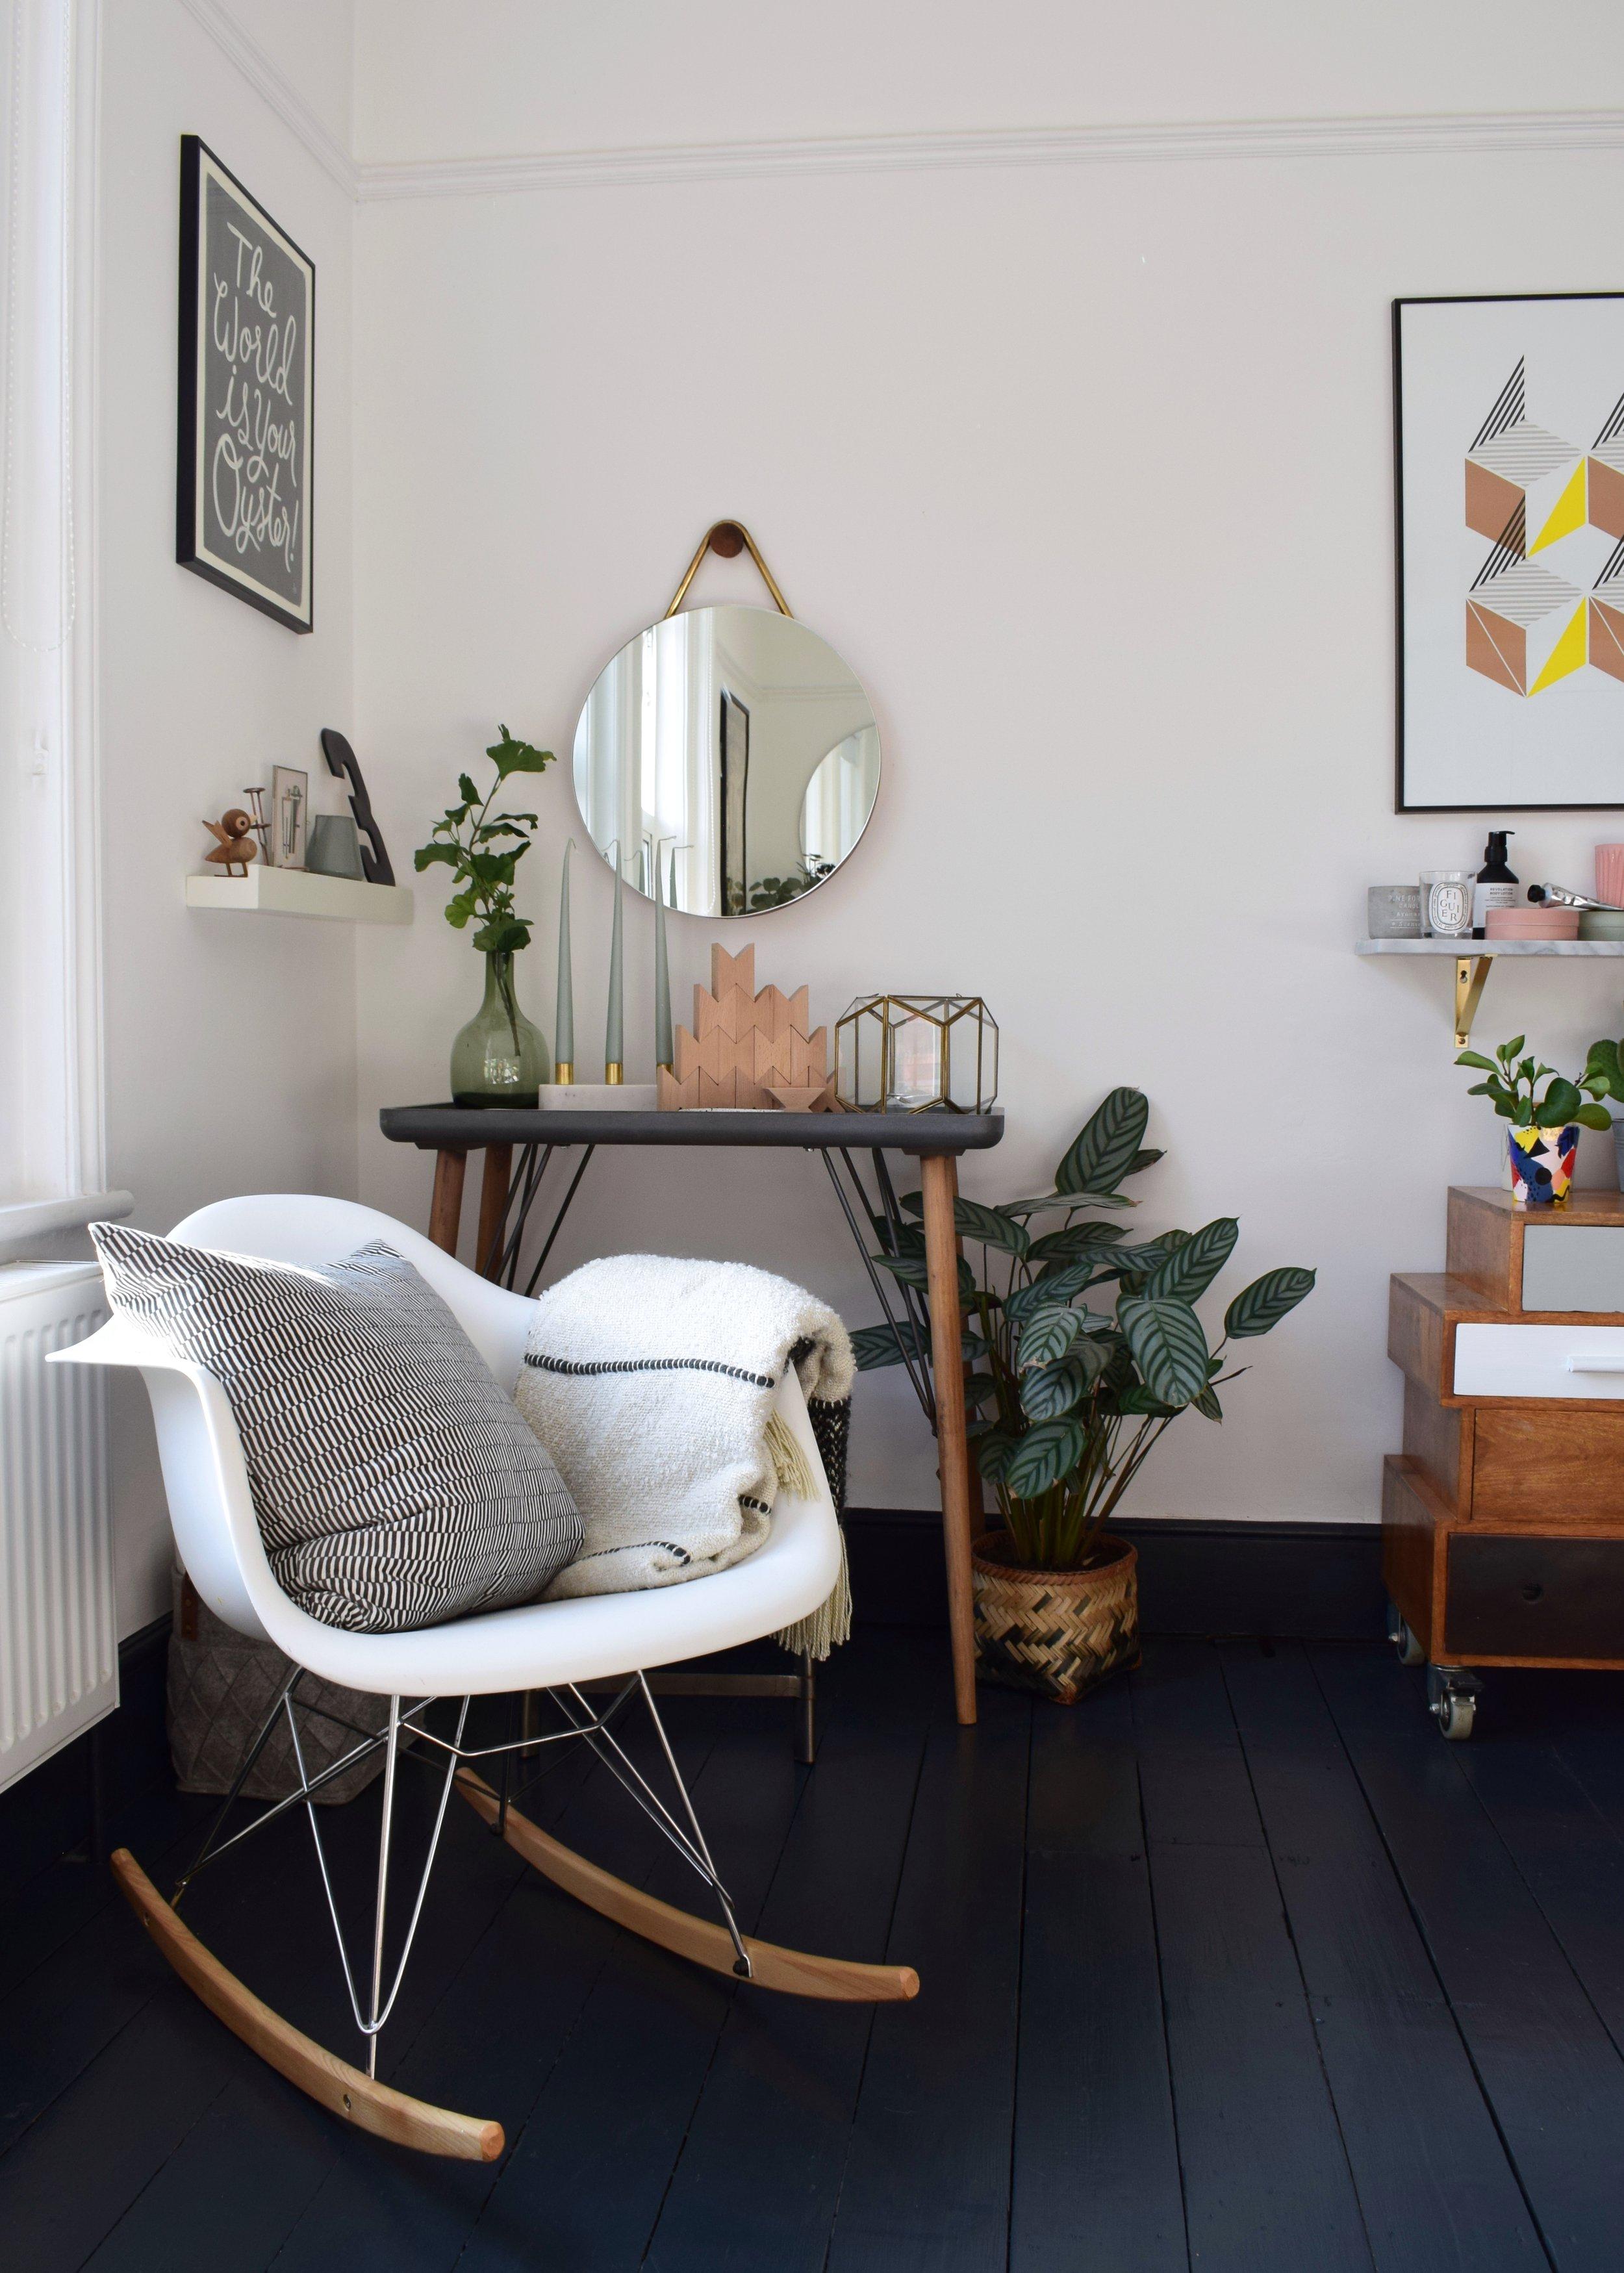 ikea faux plants foliage scandinavian bedroom interior styling ideas and inspiration (9) copy.jpg